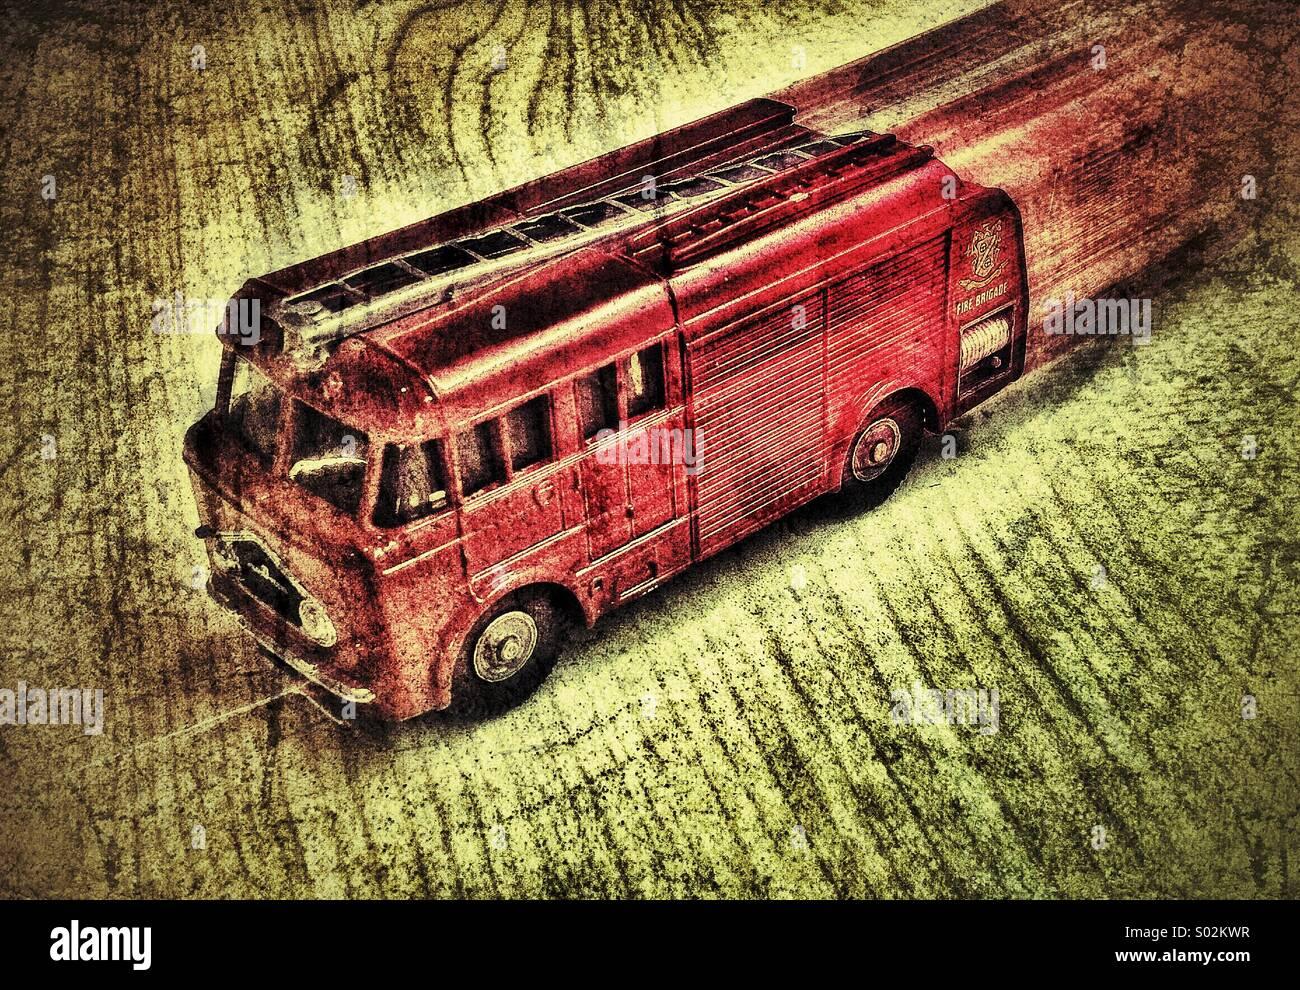 Feuerwehrauto Stockbild